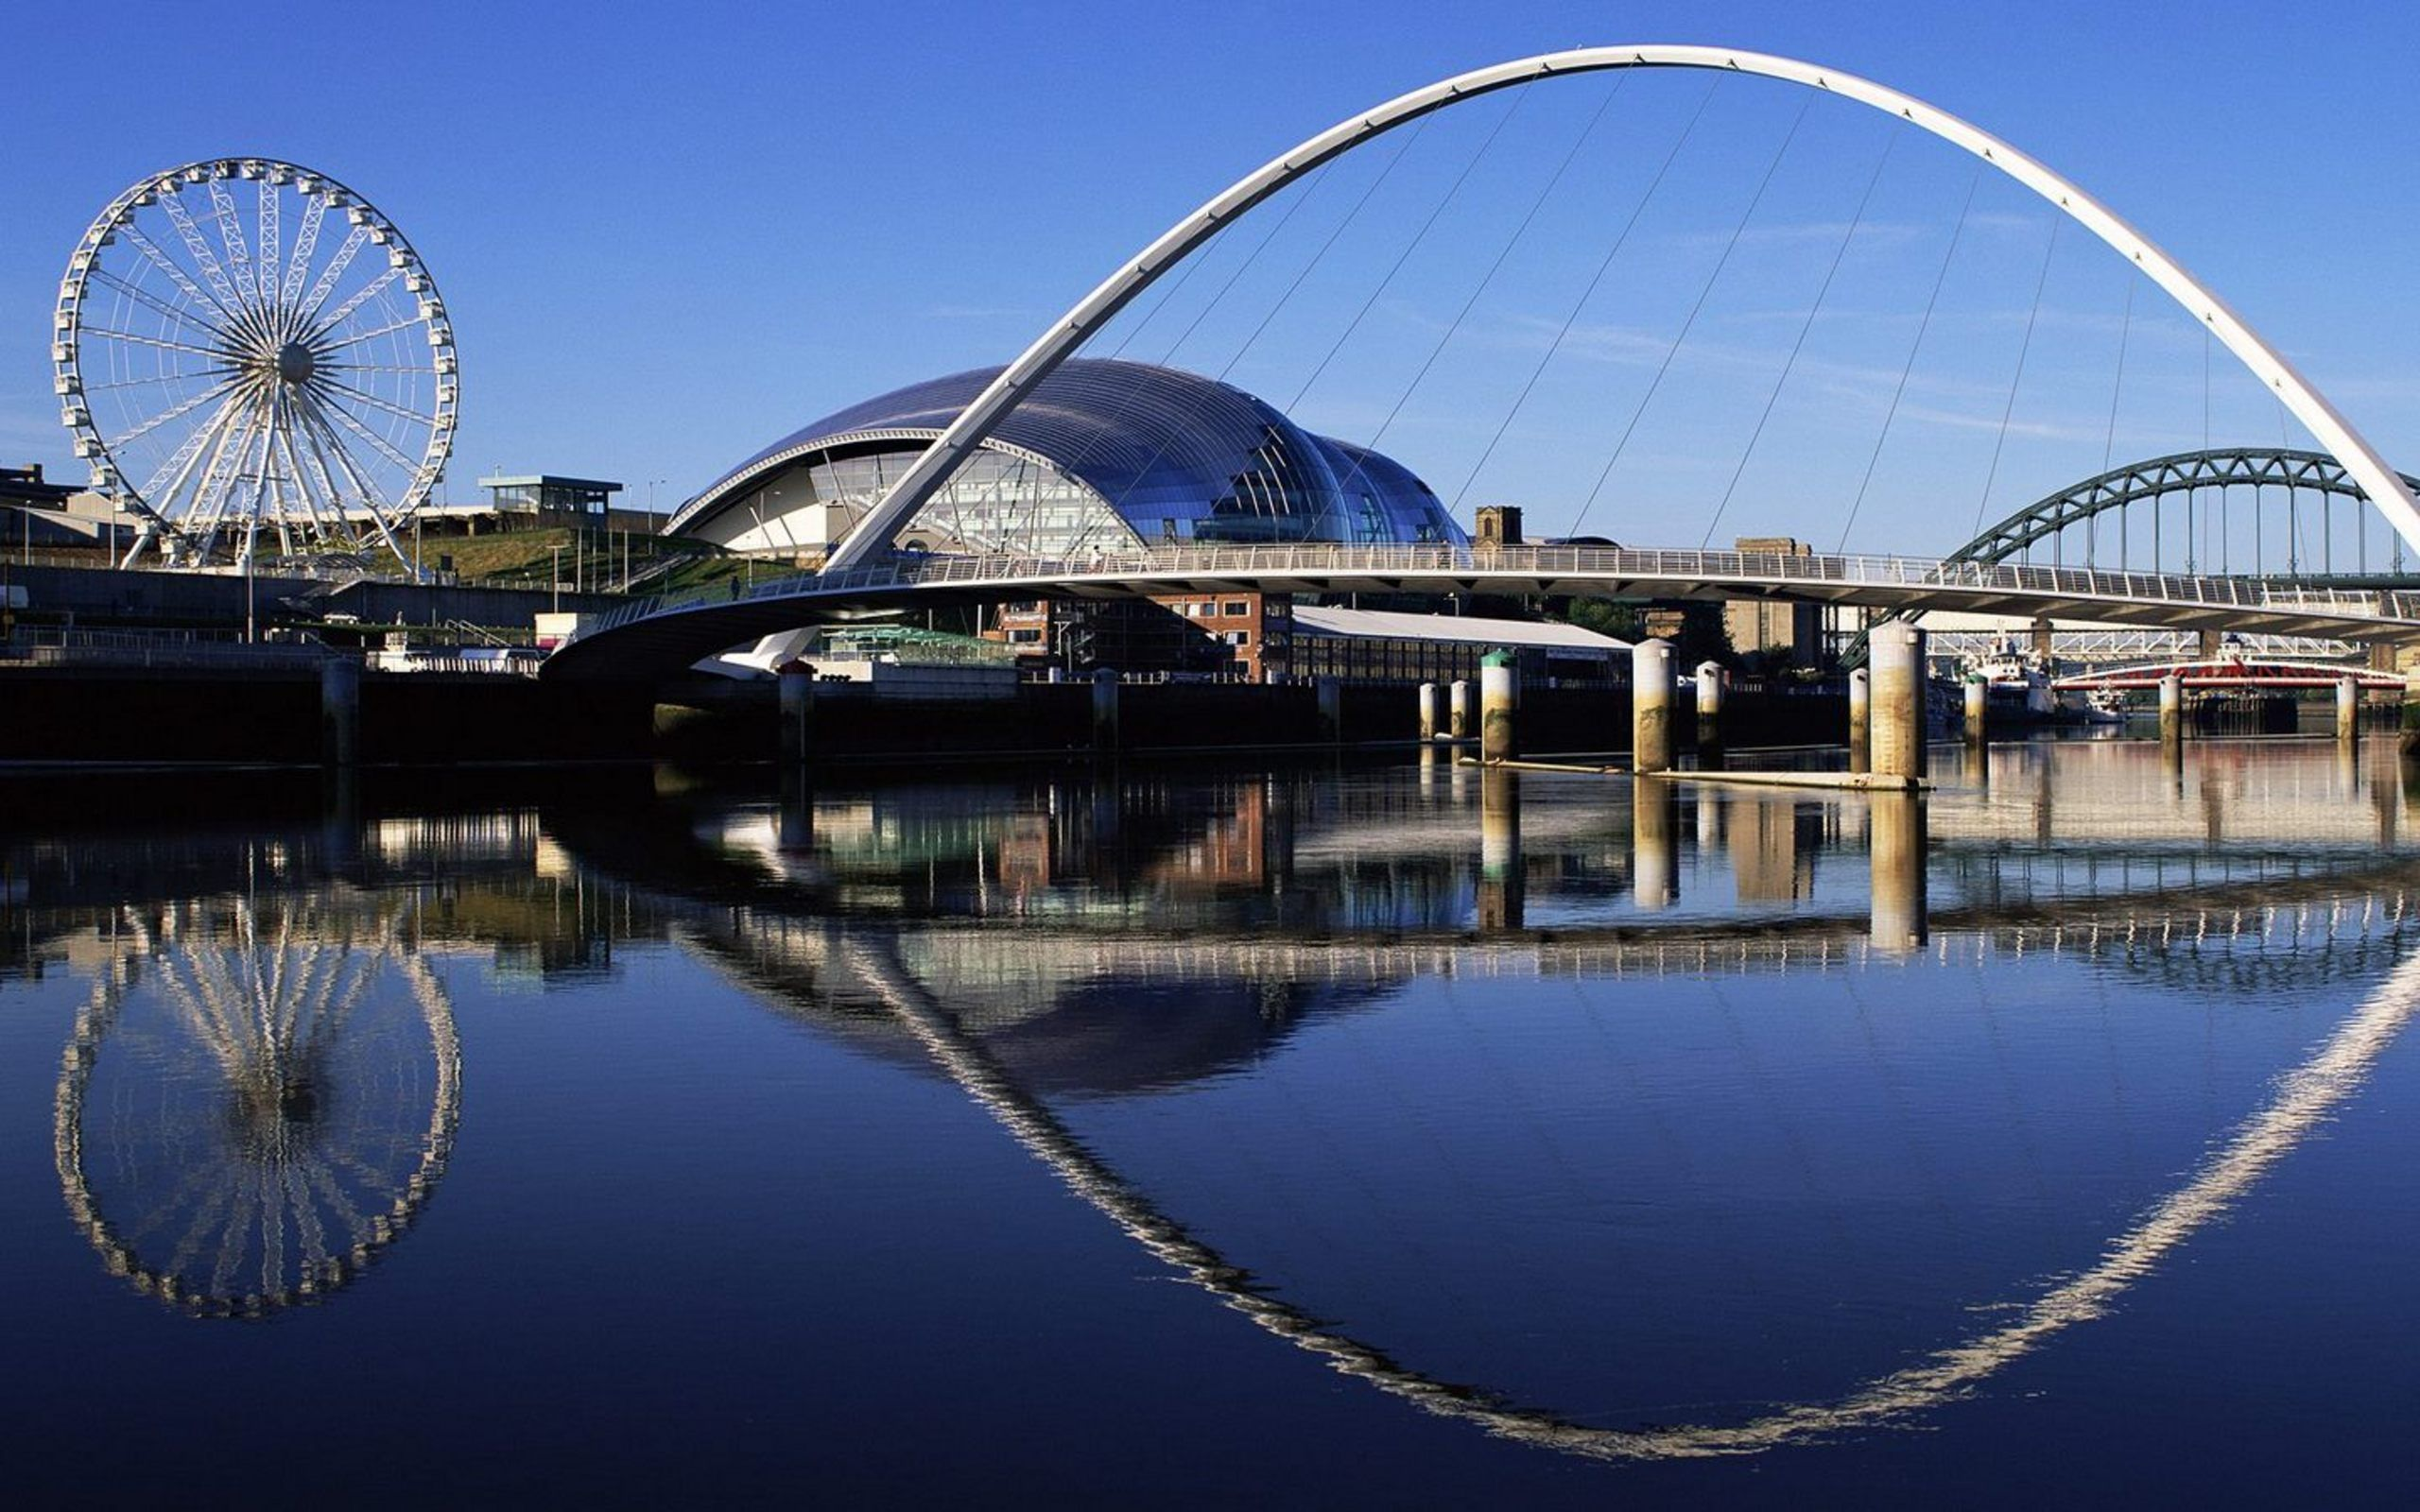 Pin By Christina Khandan On England Millennium Bridge Gateshead Millennium Bridge England Travel